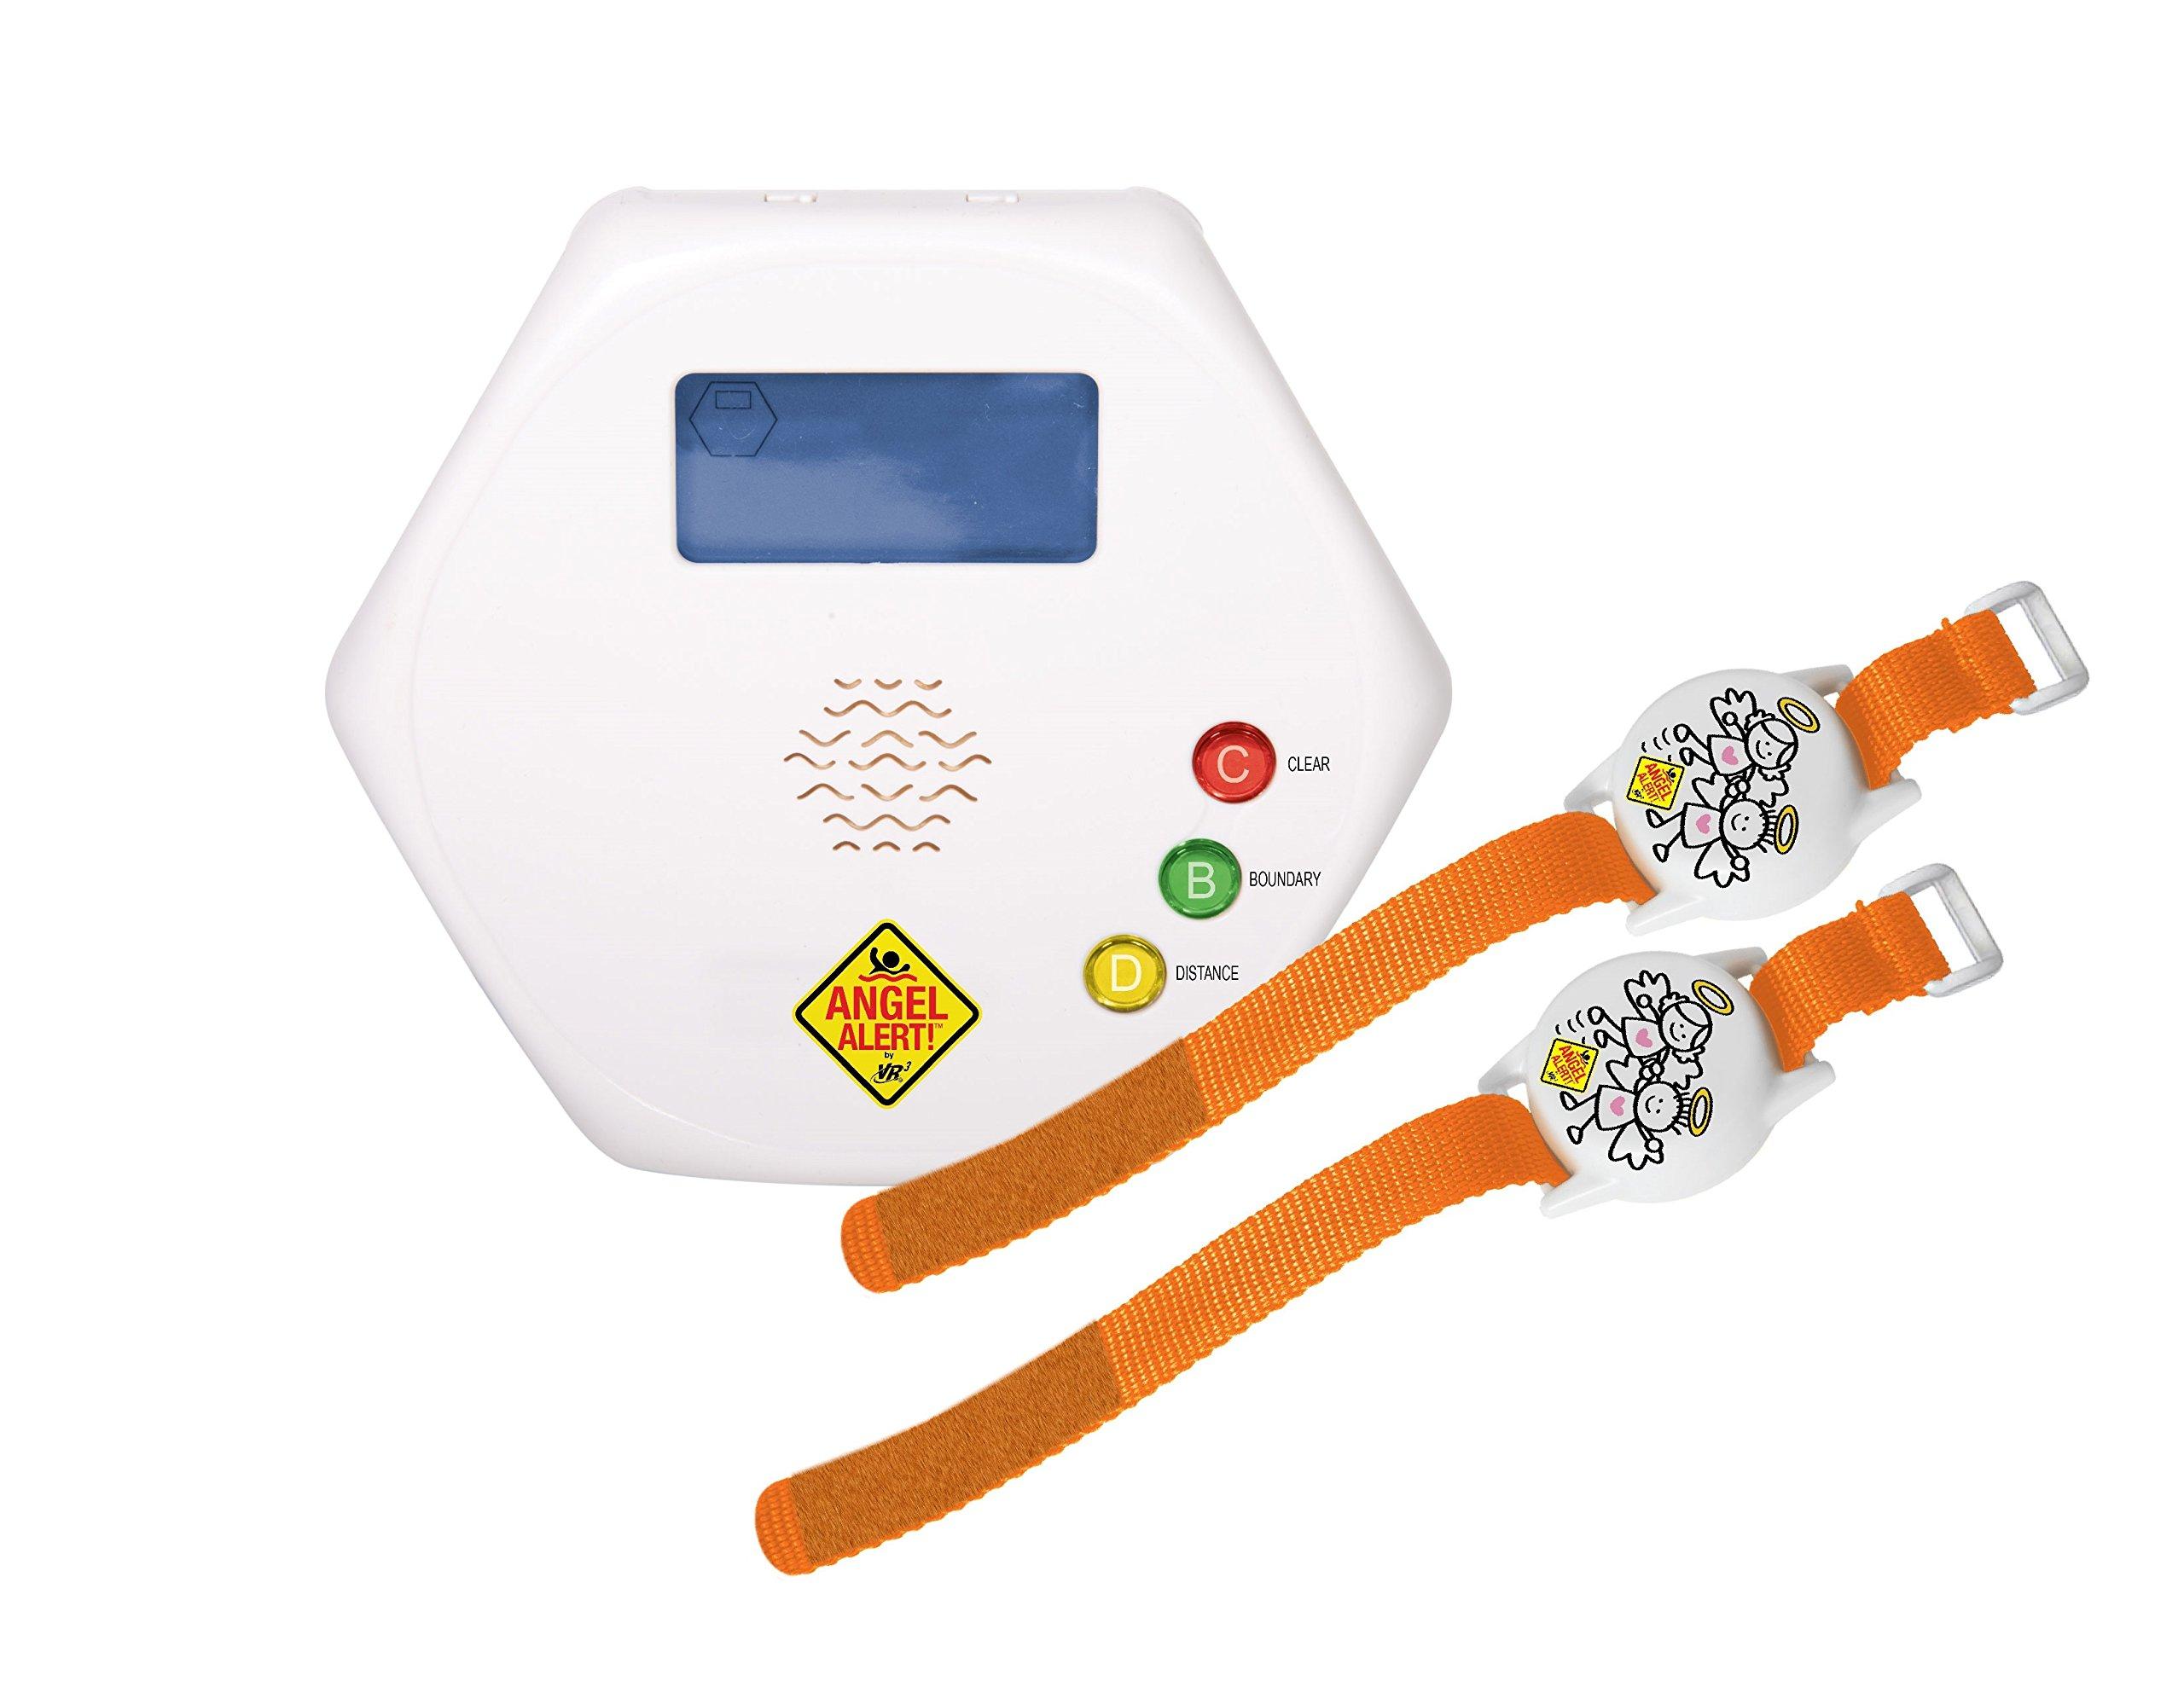 Angel Alert Wireless Pool Guardian and Boundary Alarm- GT-ADA100-2B by Pool Angel